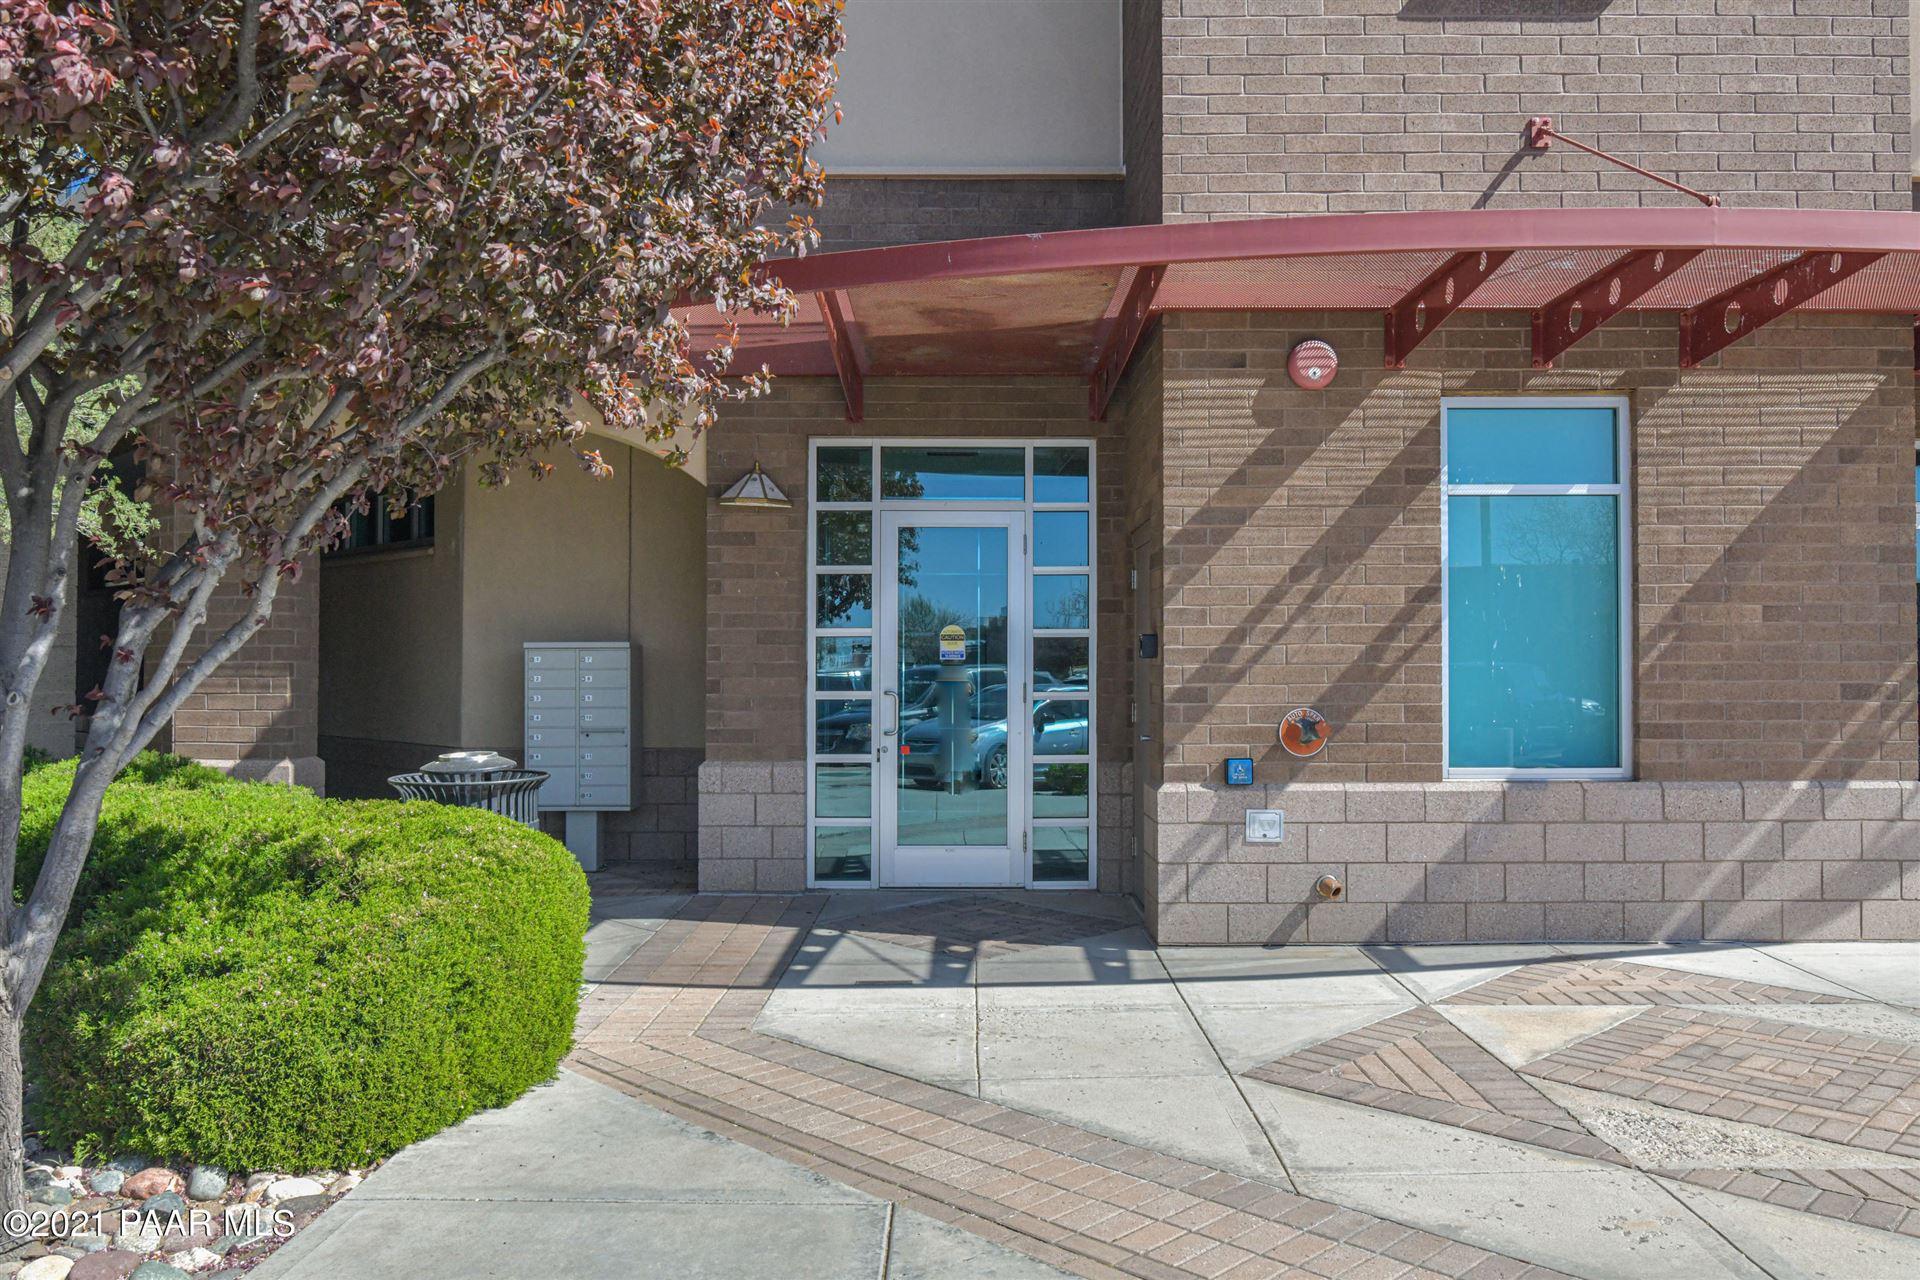 Photo of 3033 N Windsong #102 Drive, Prescott Valley, AZ 86314 (MLS # 1037668)